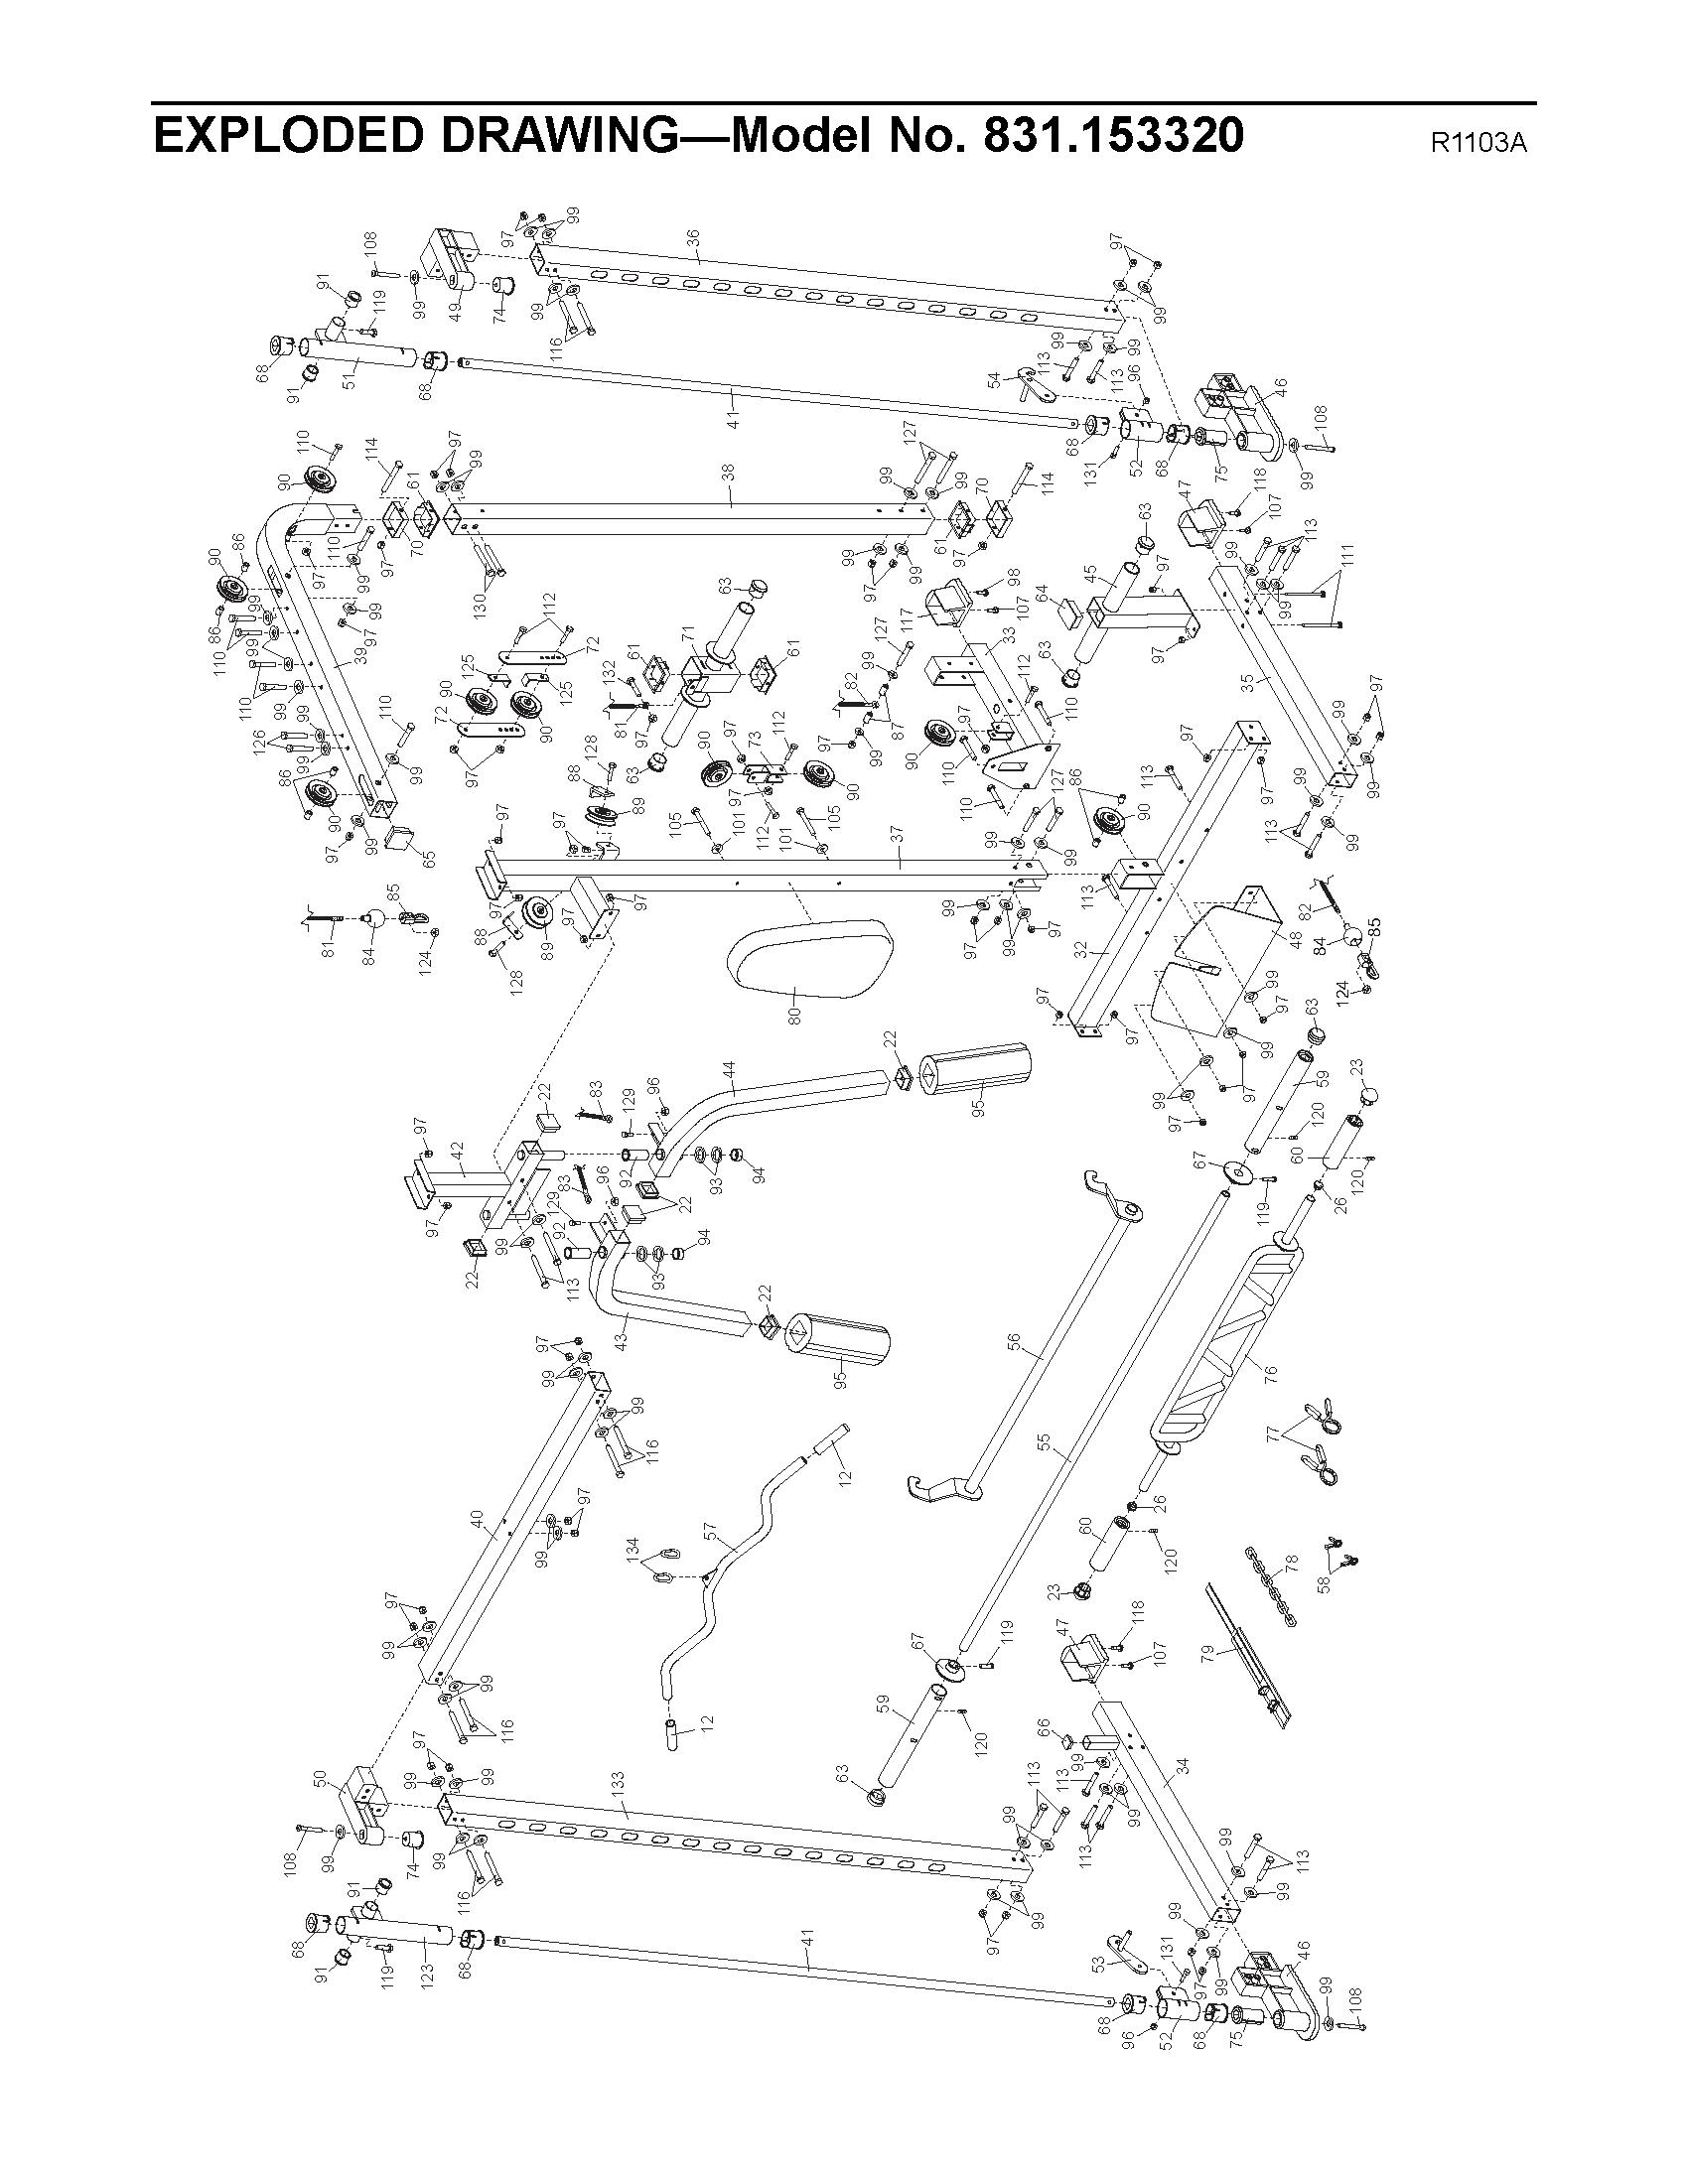 Proform C840 Parts